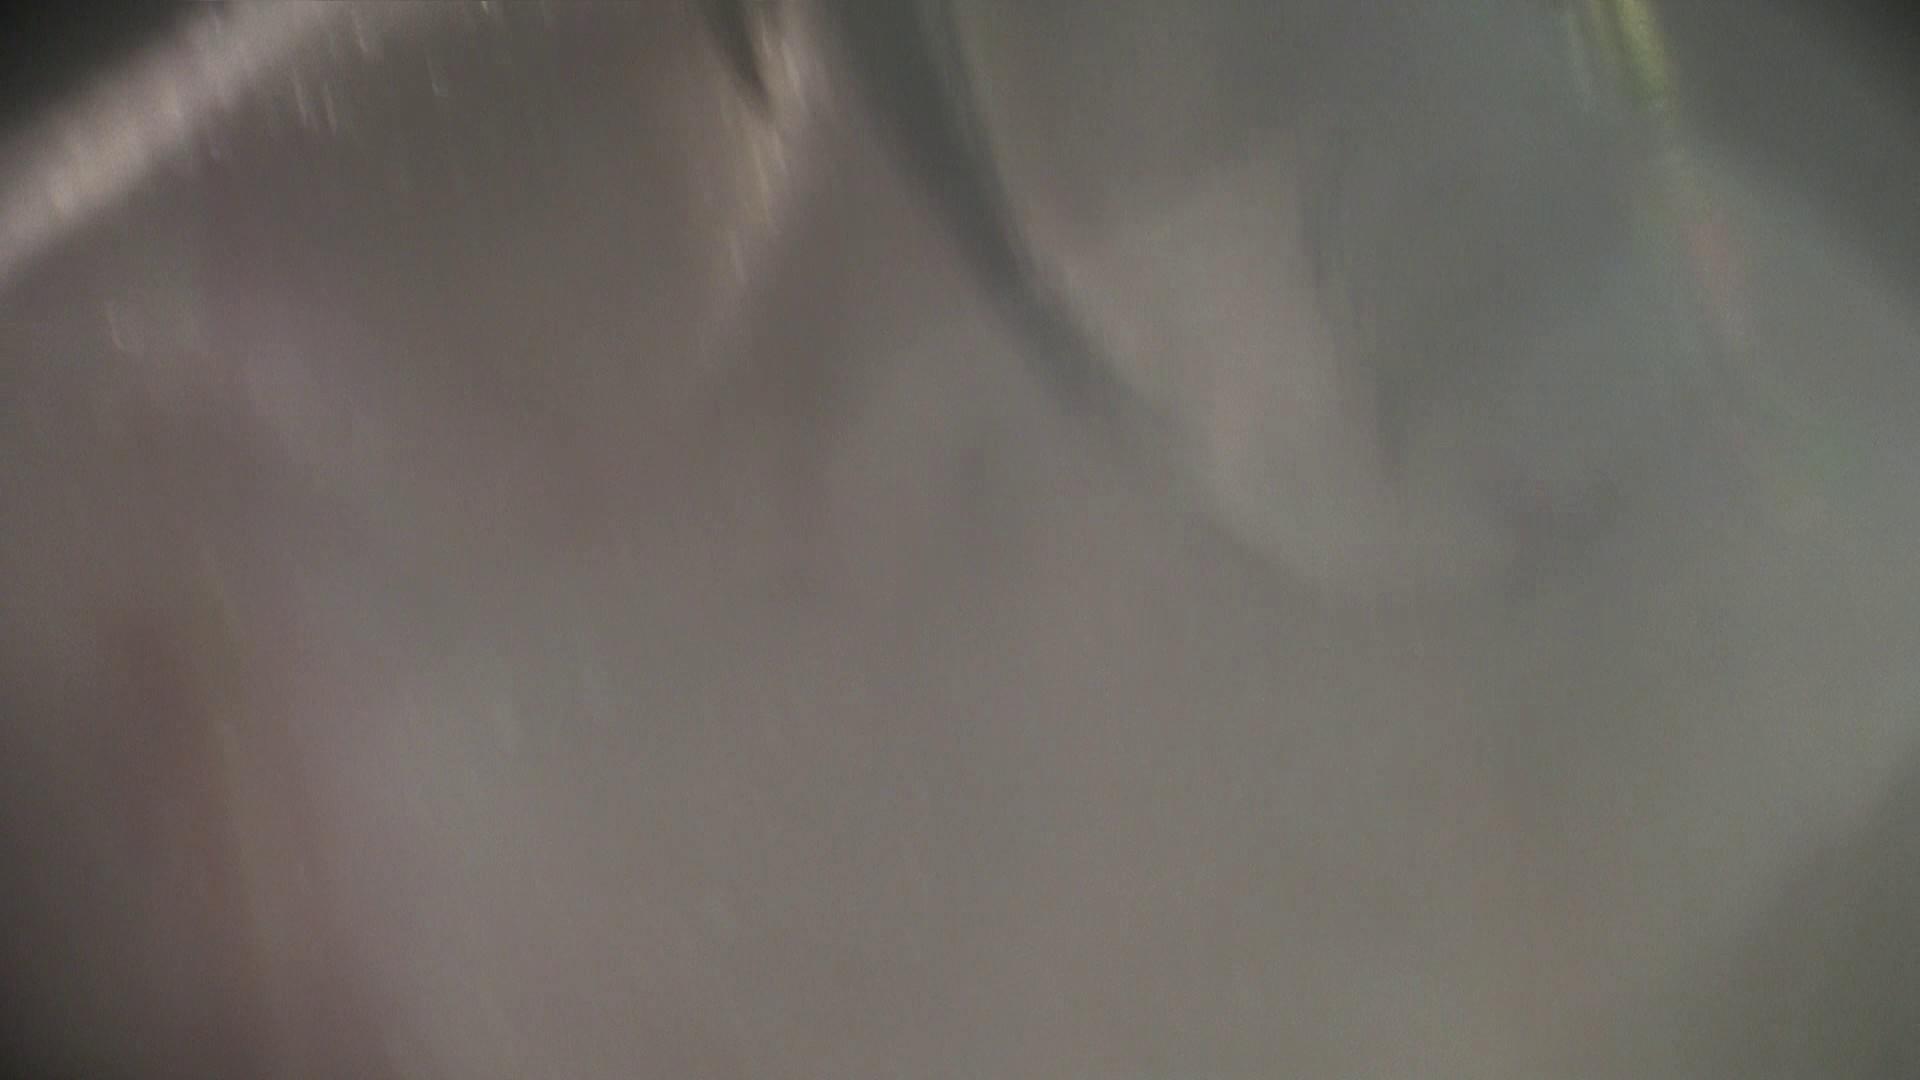 NO.11 年増の一本道!!中身ハミ出てます 丸見え オマンコ無修正動画無料 97画像 58